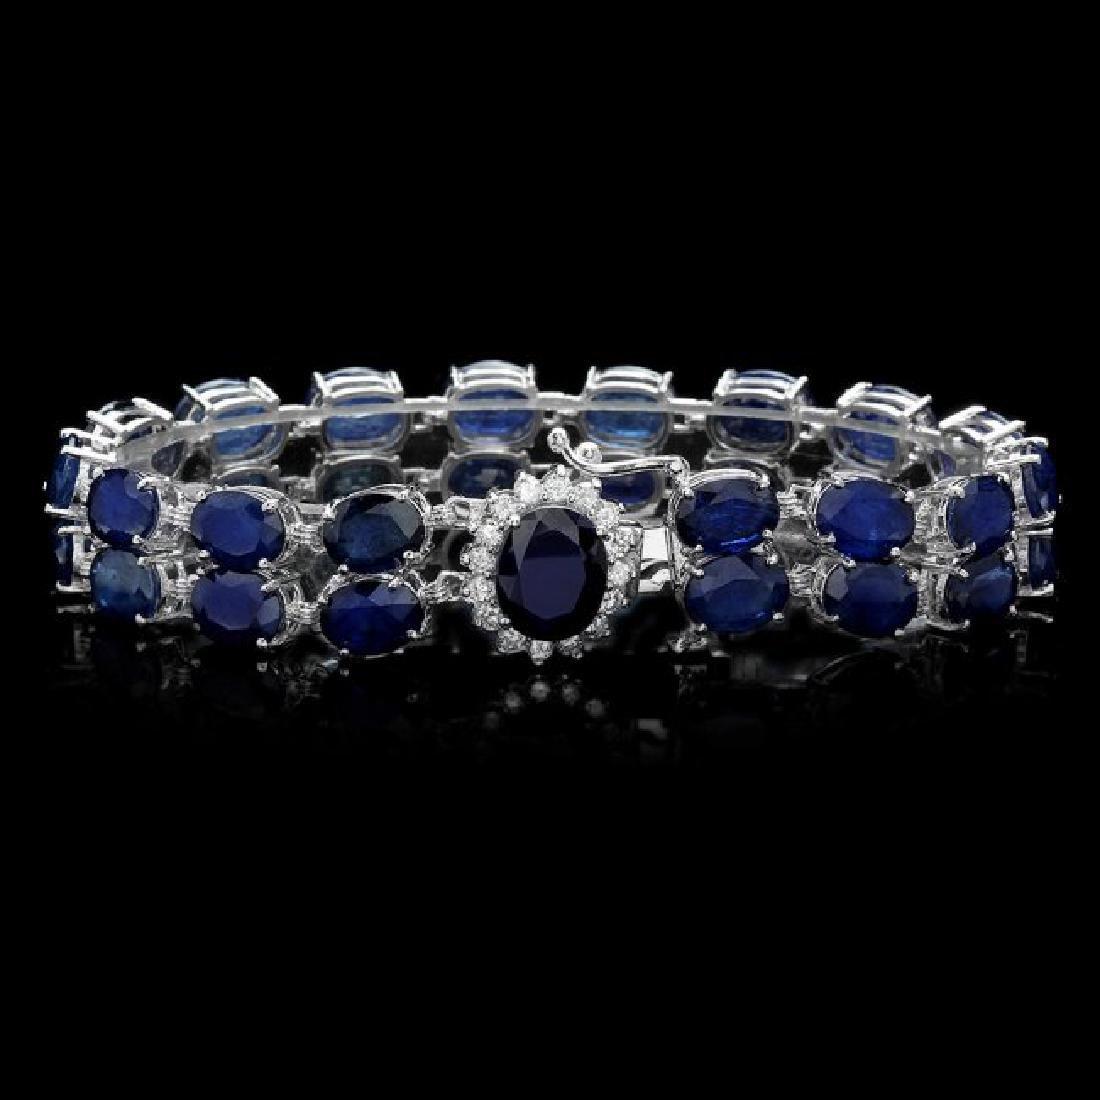 14k Gold 49.5ct Sapphire 0.65ct Diamond Bracelet